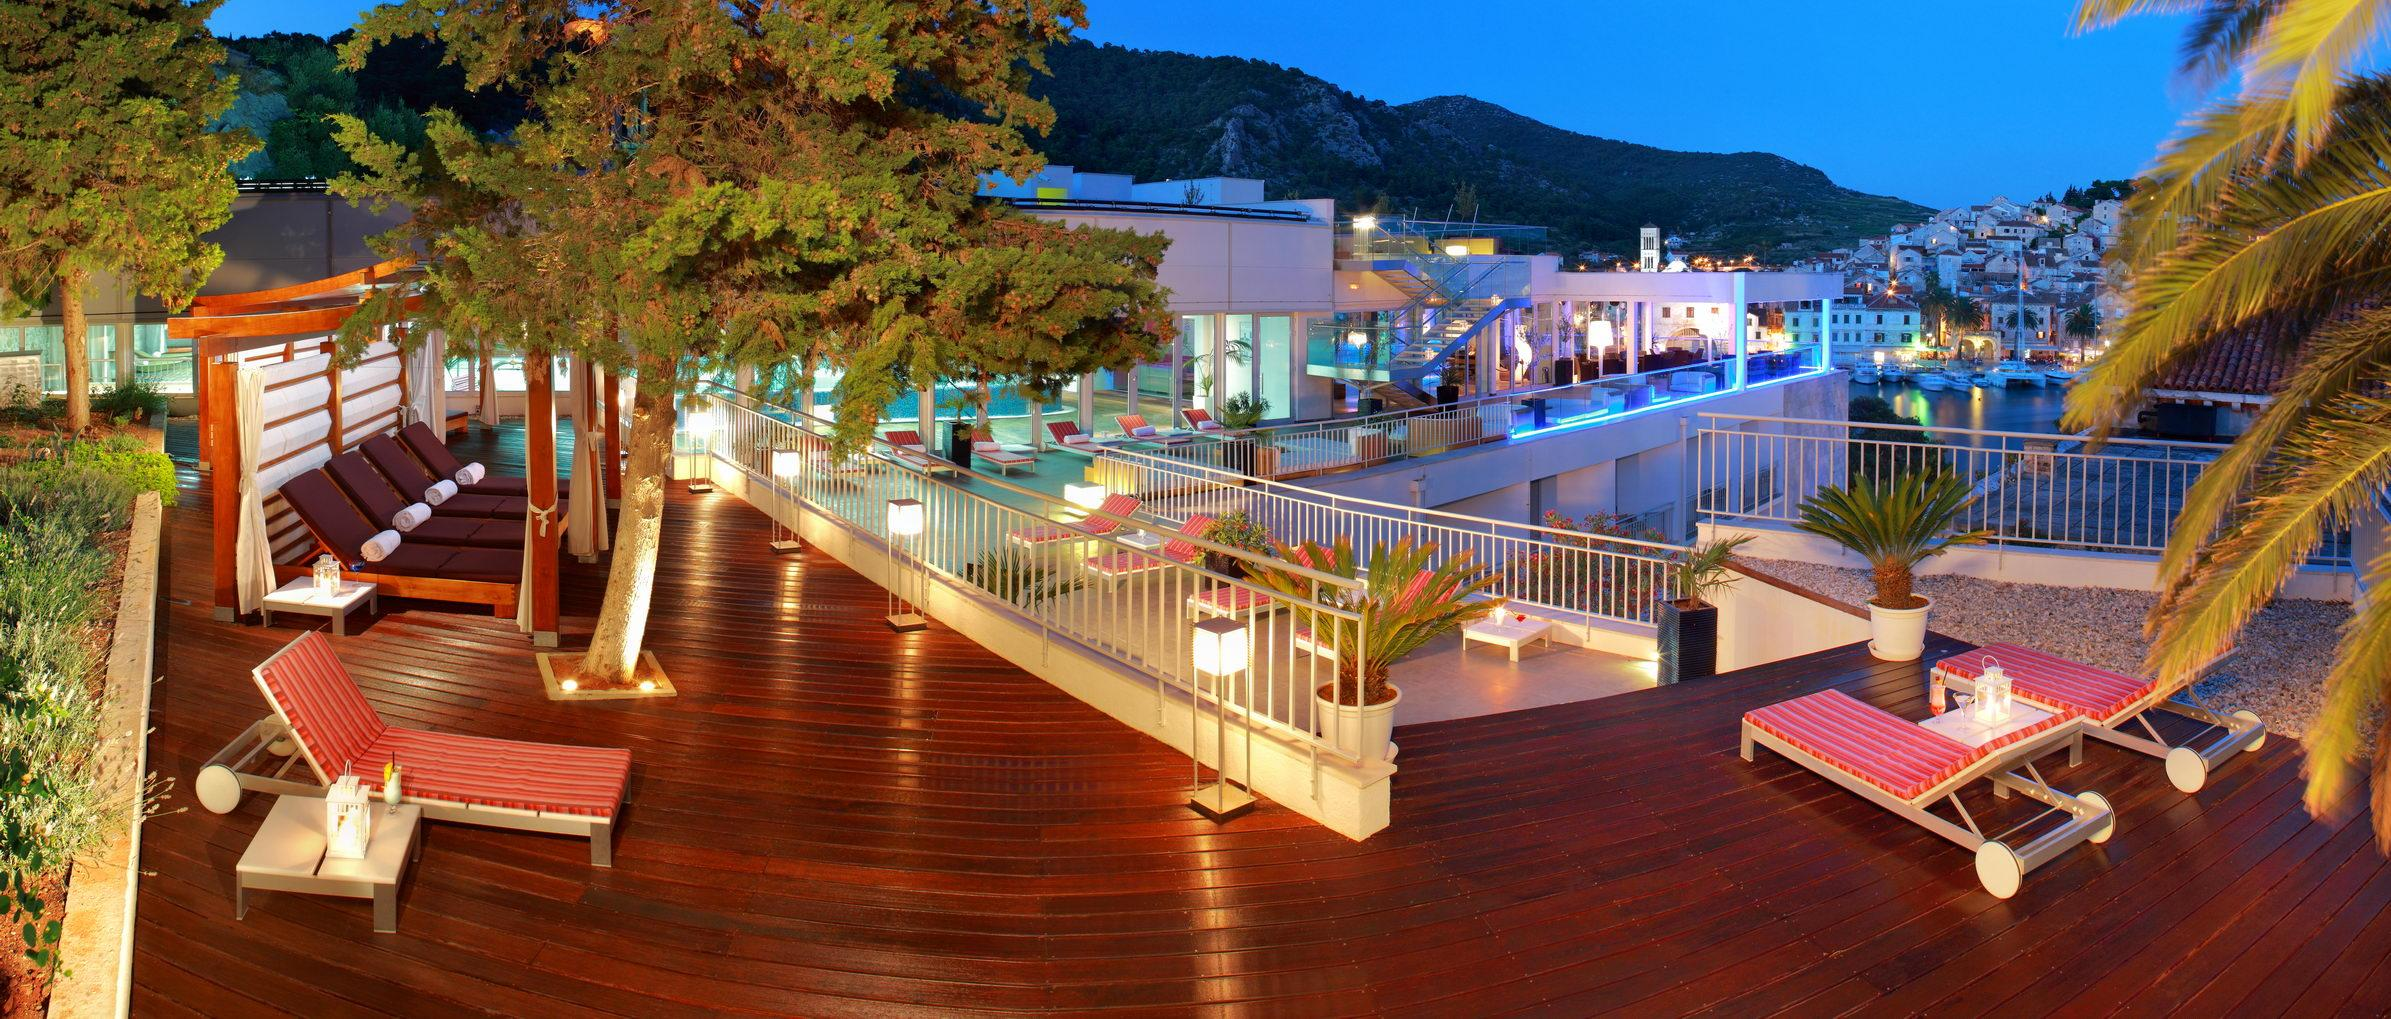 Offre spéciale Adriana Hvar Spa Hotel - Croatie - promo - hebergement